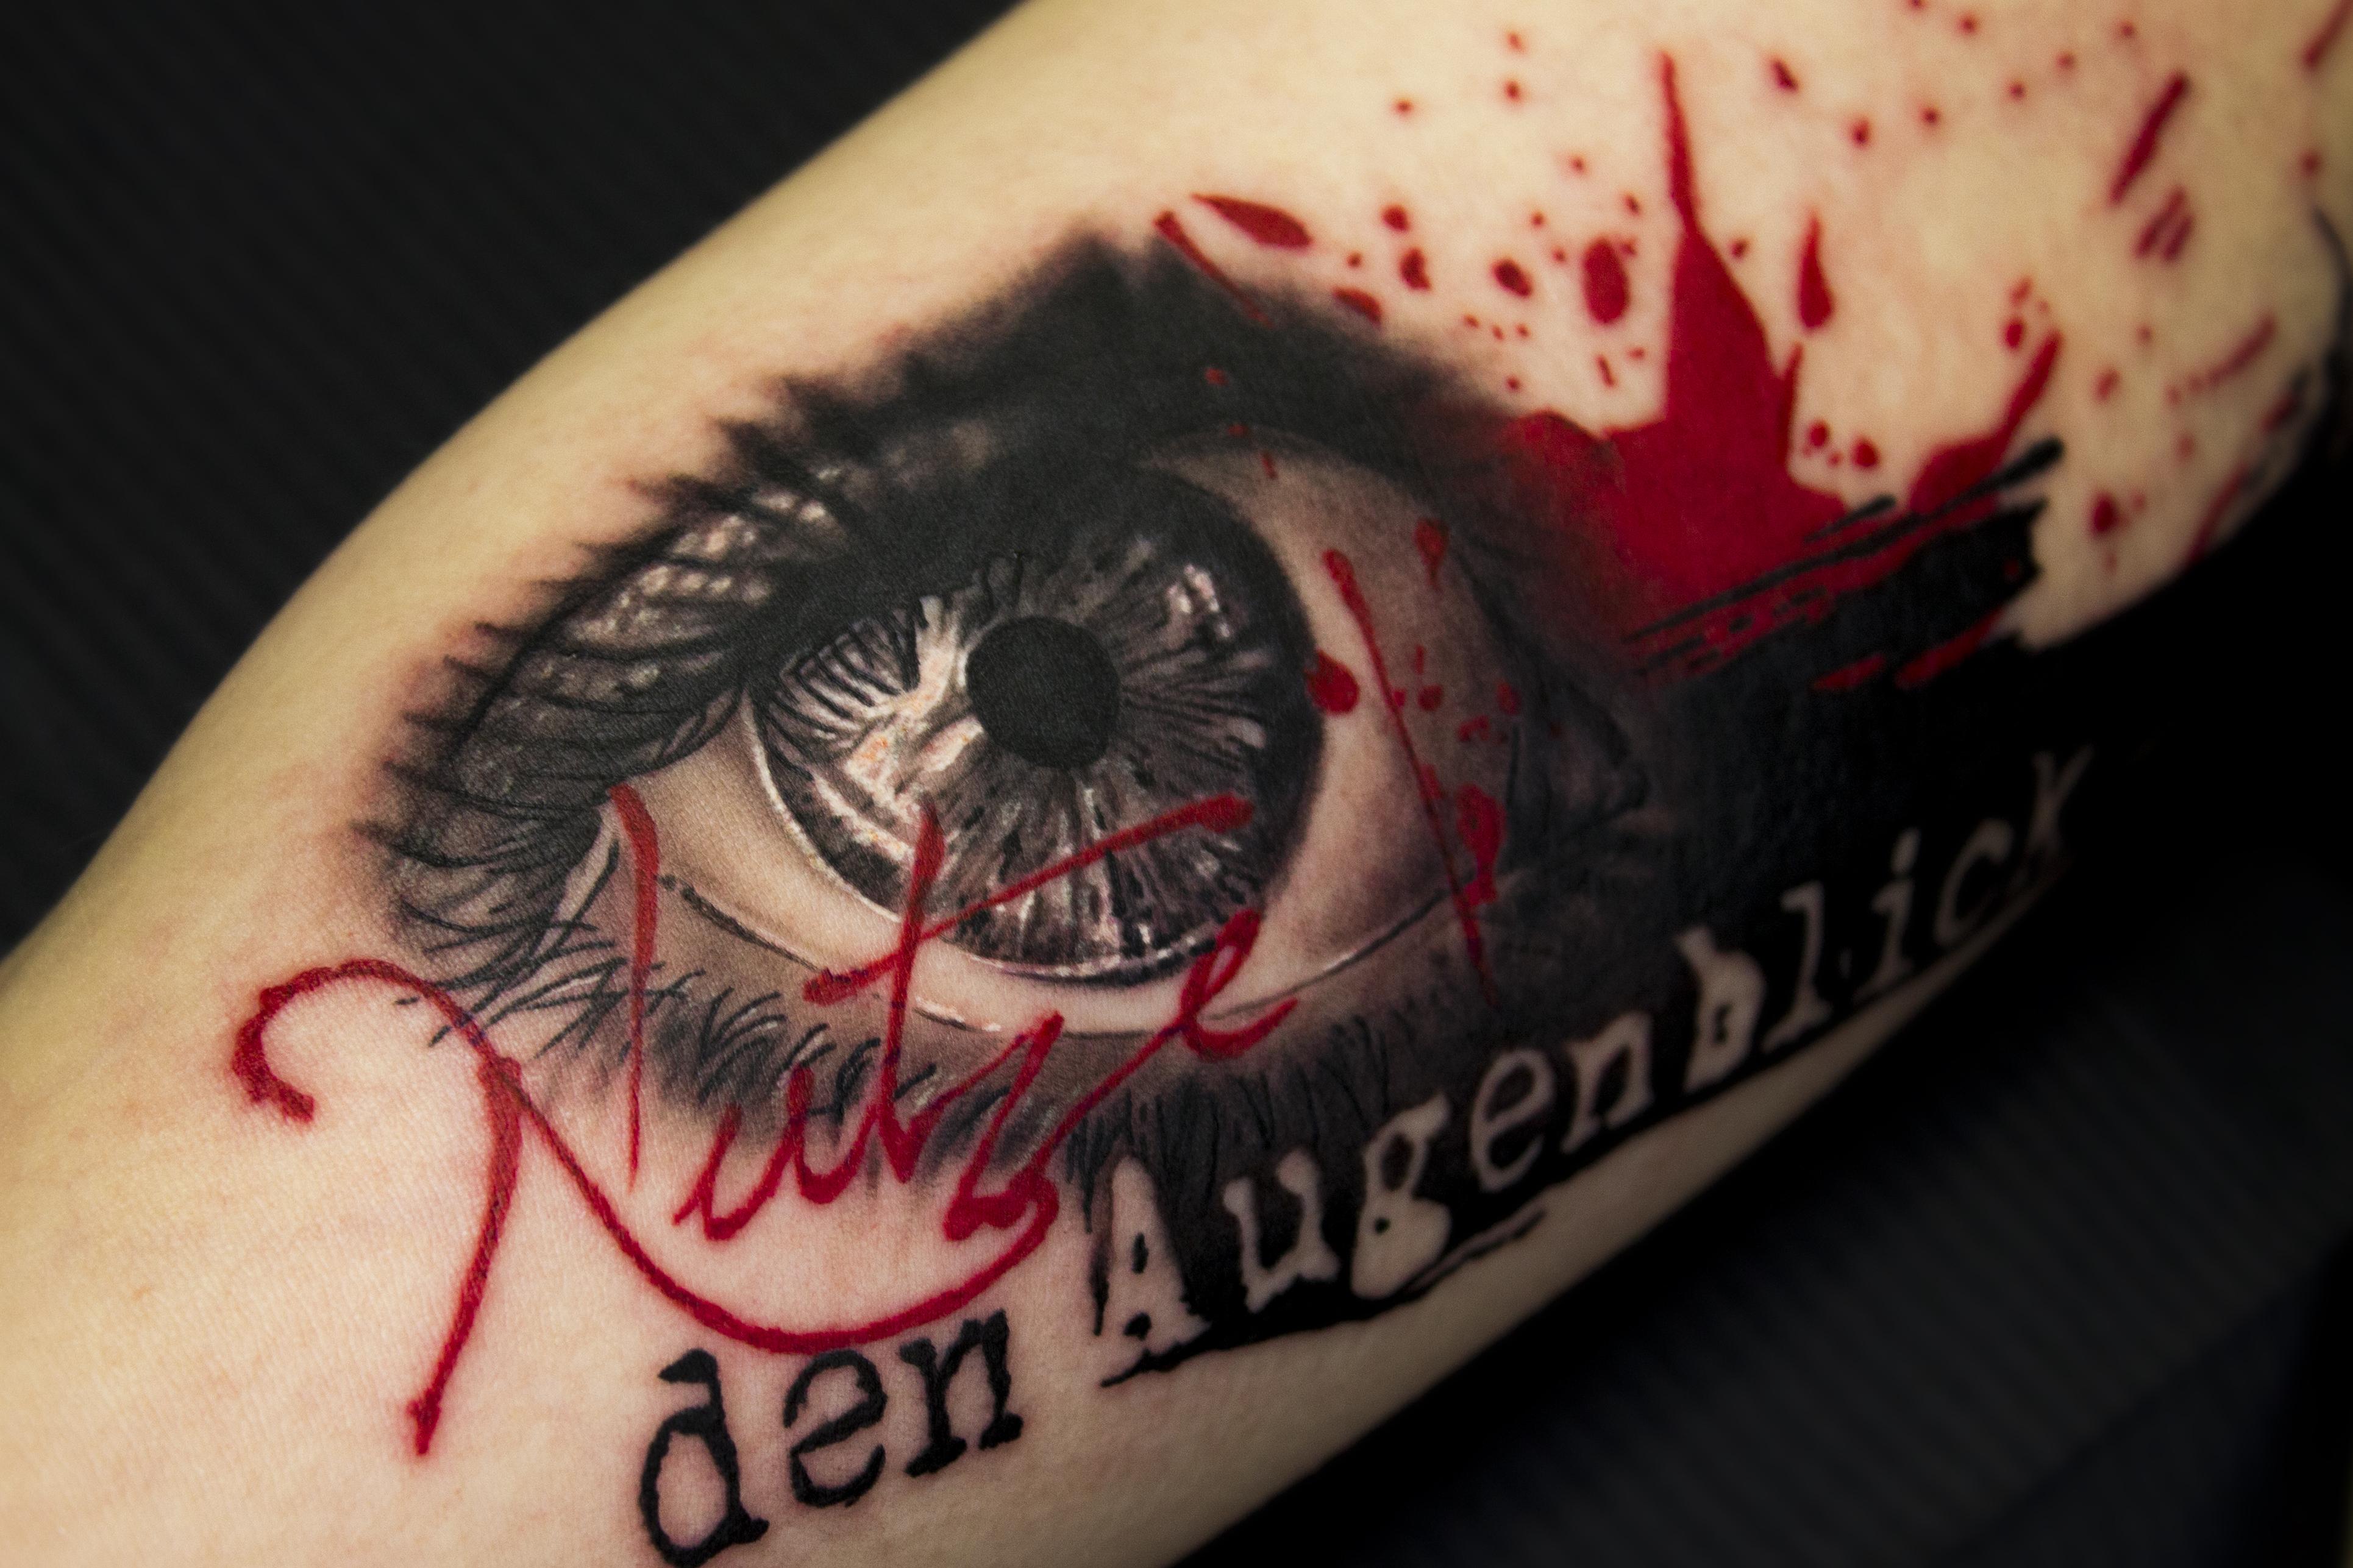 tattoo 174b Biro Blanka tetovalo tattooist tattoo artist taetowierer selfmade berlin selfmadeberlin realistic realistisch auge eye details detailliert trashpolka lettering schriftzug rot - Trash Polka Tattoo Artists